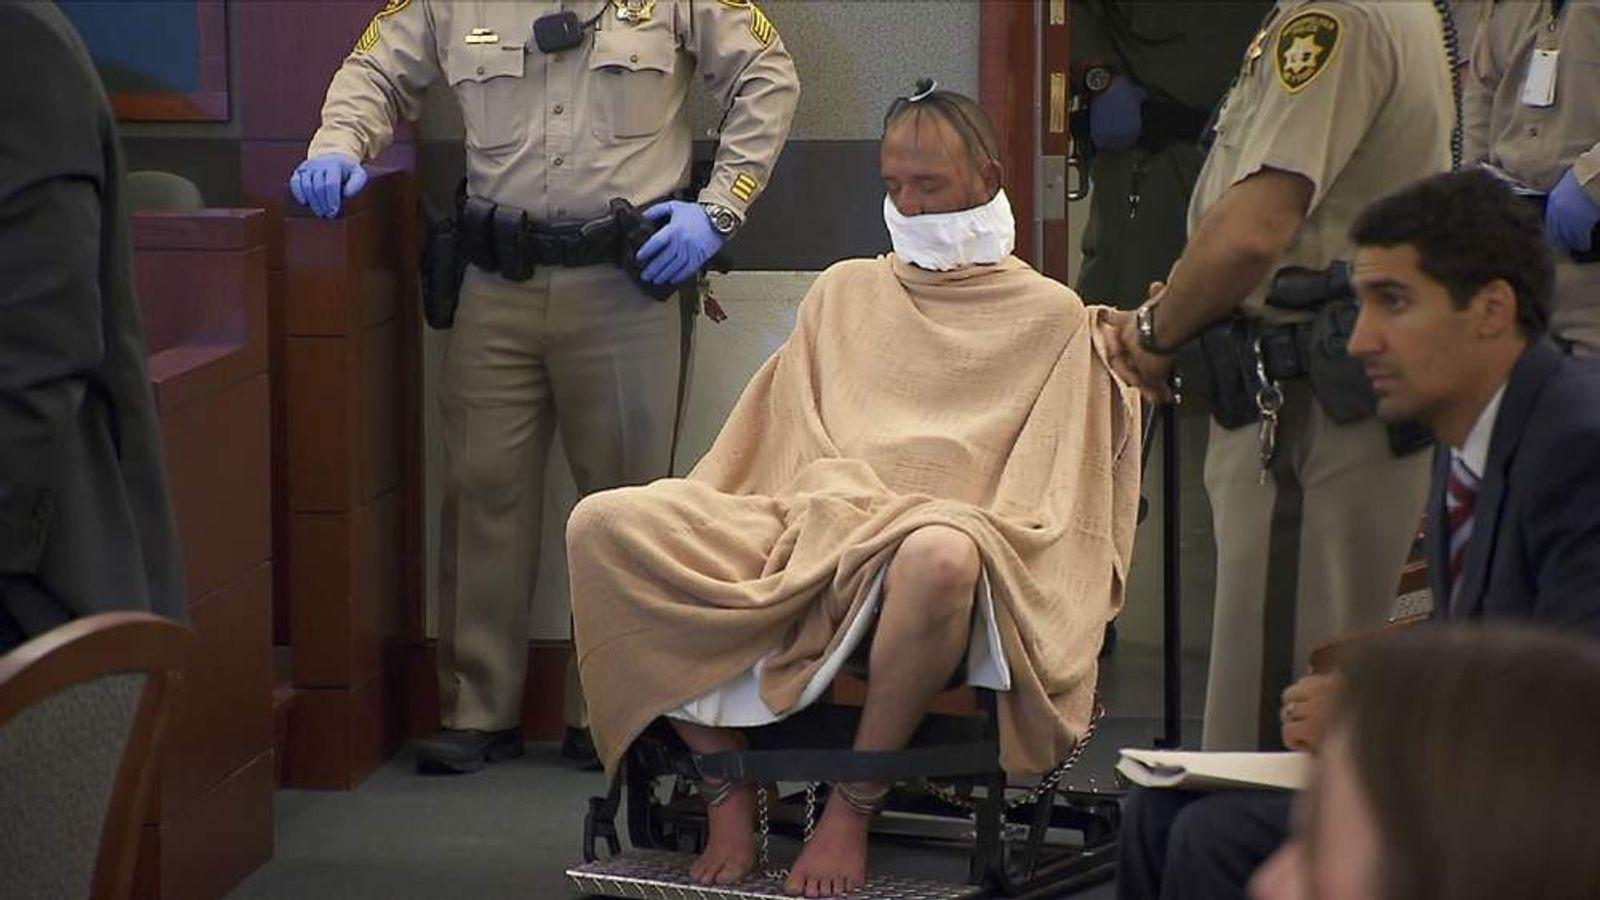 Vegas Casino Heist Suspect Restrained In Court